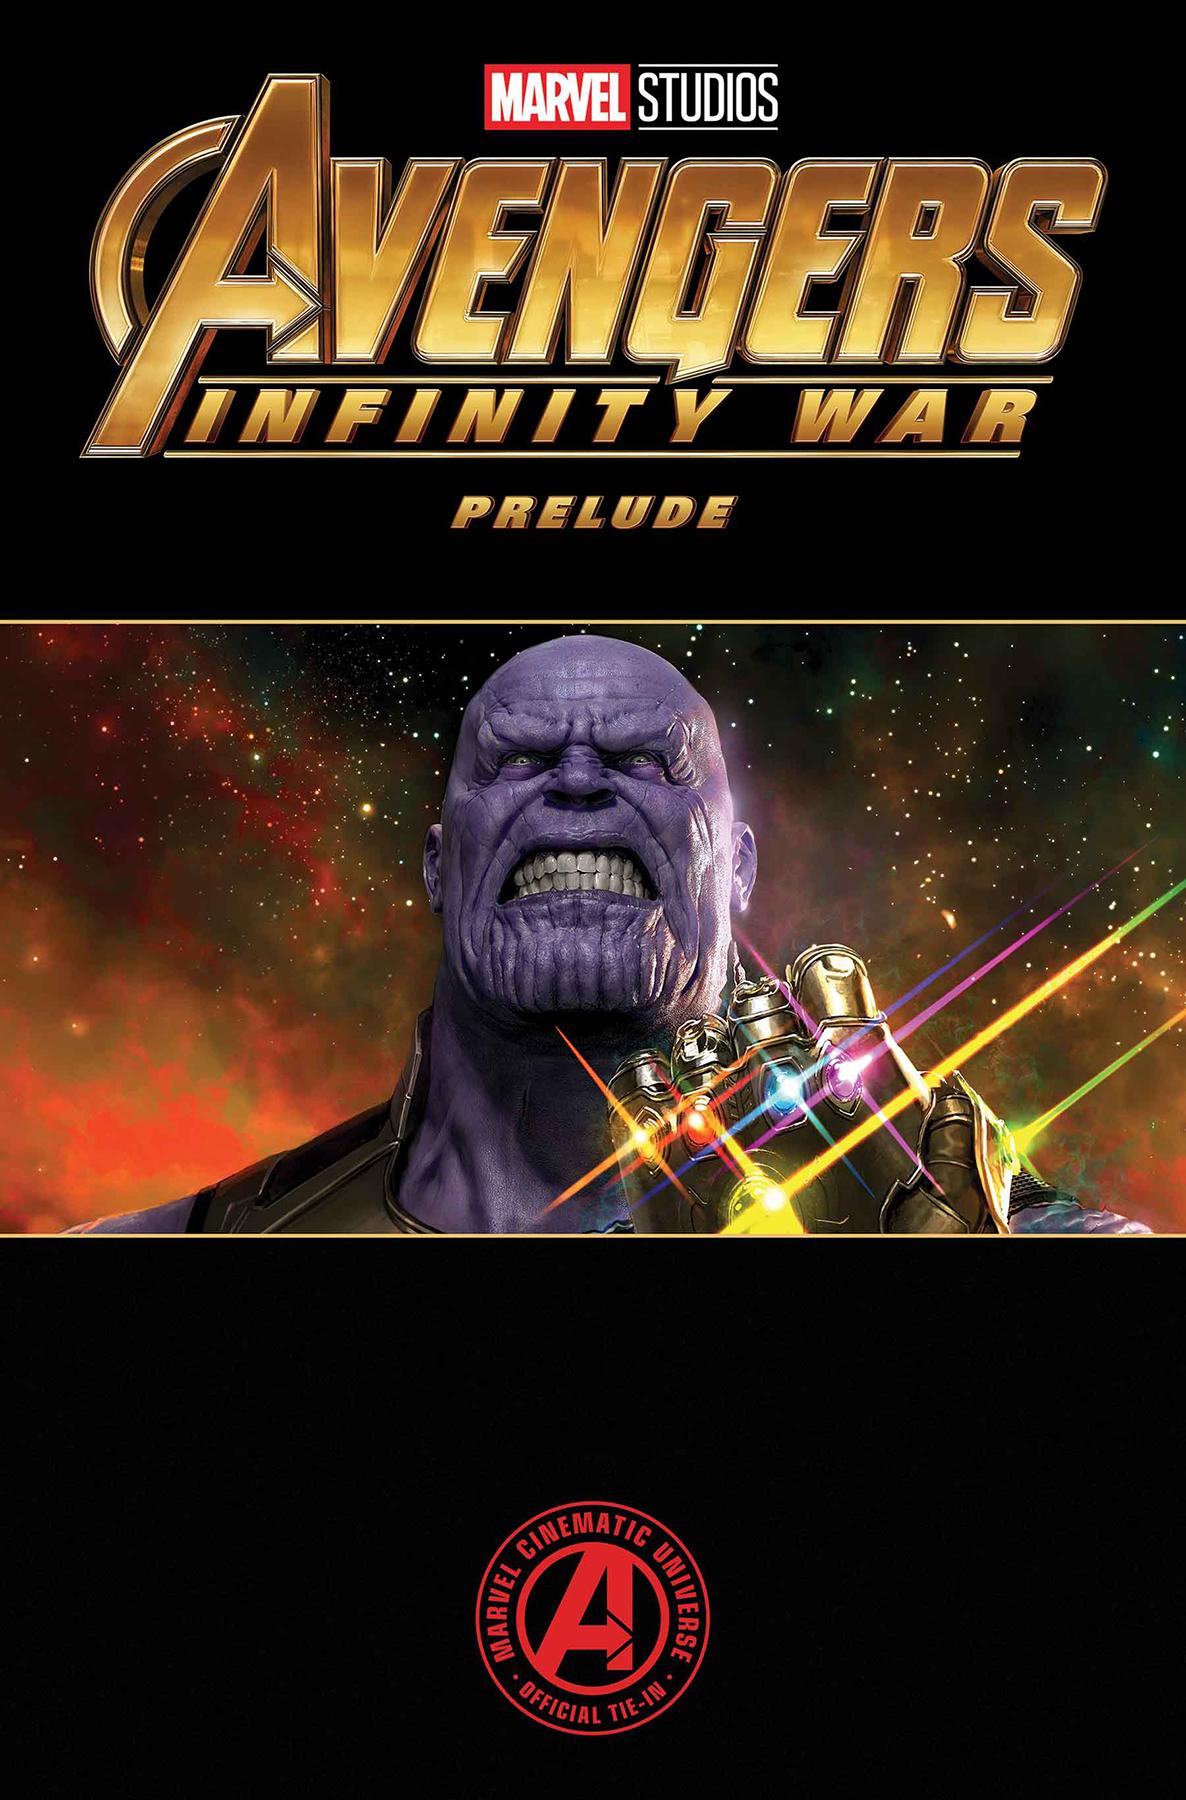 avengers infinity war part 2 trailer release date